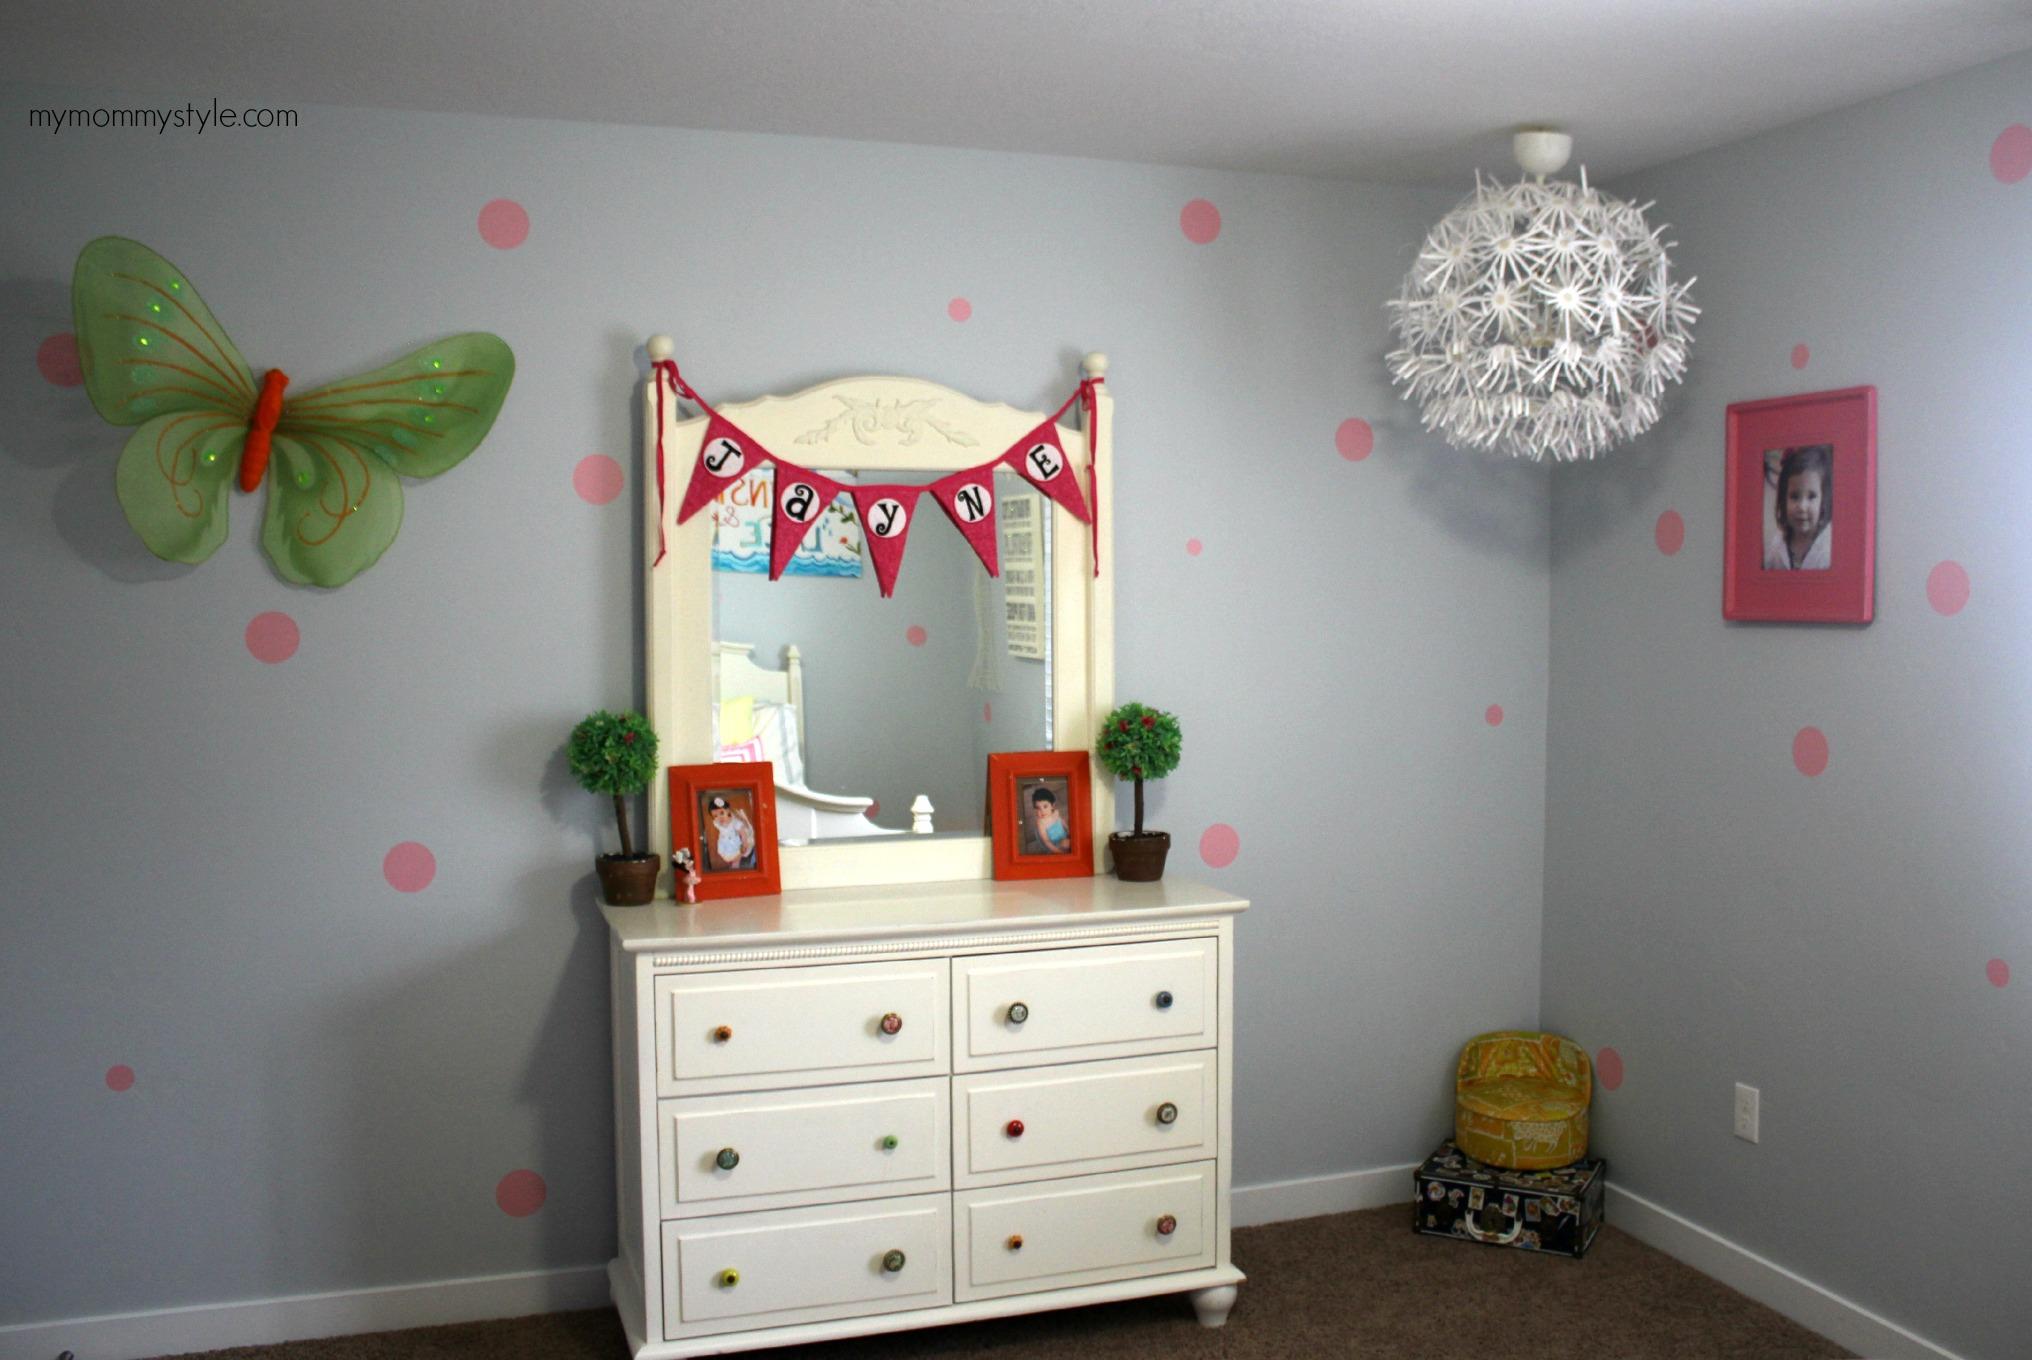 Little Girls room, polka dot walls, mymommystyle.com